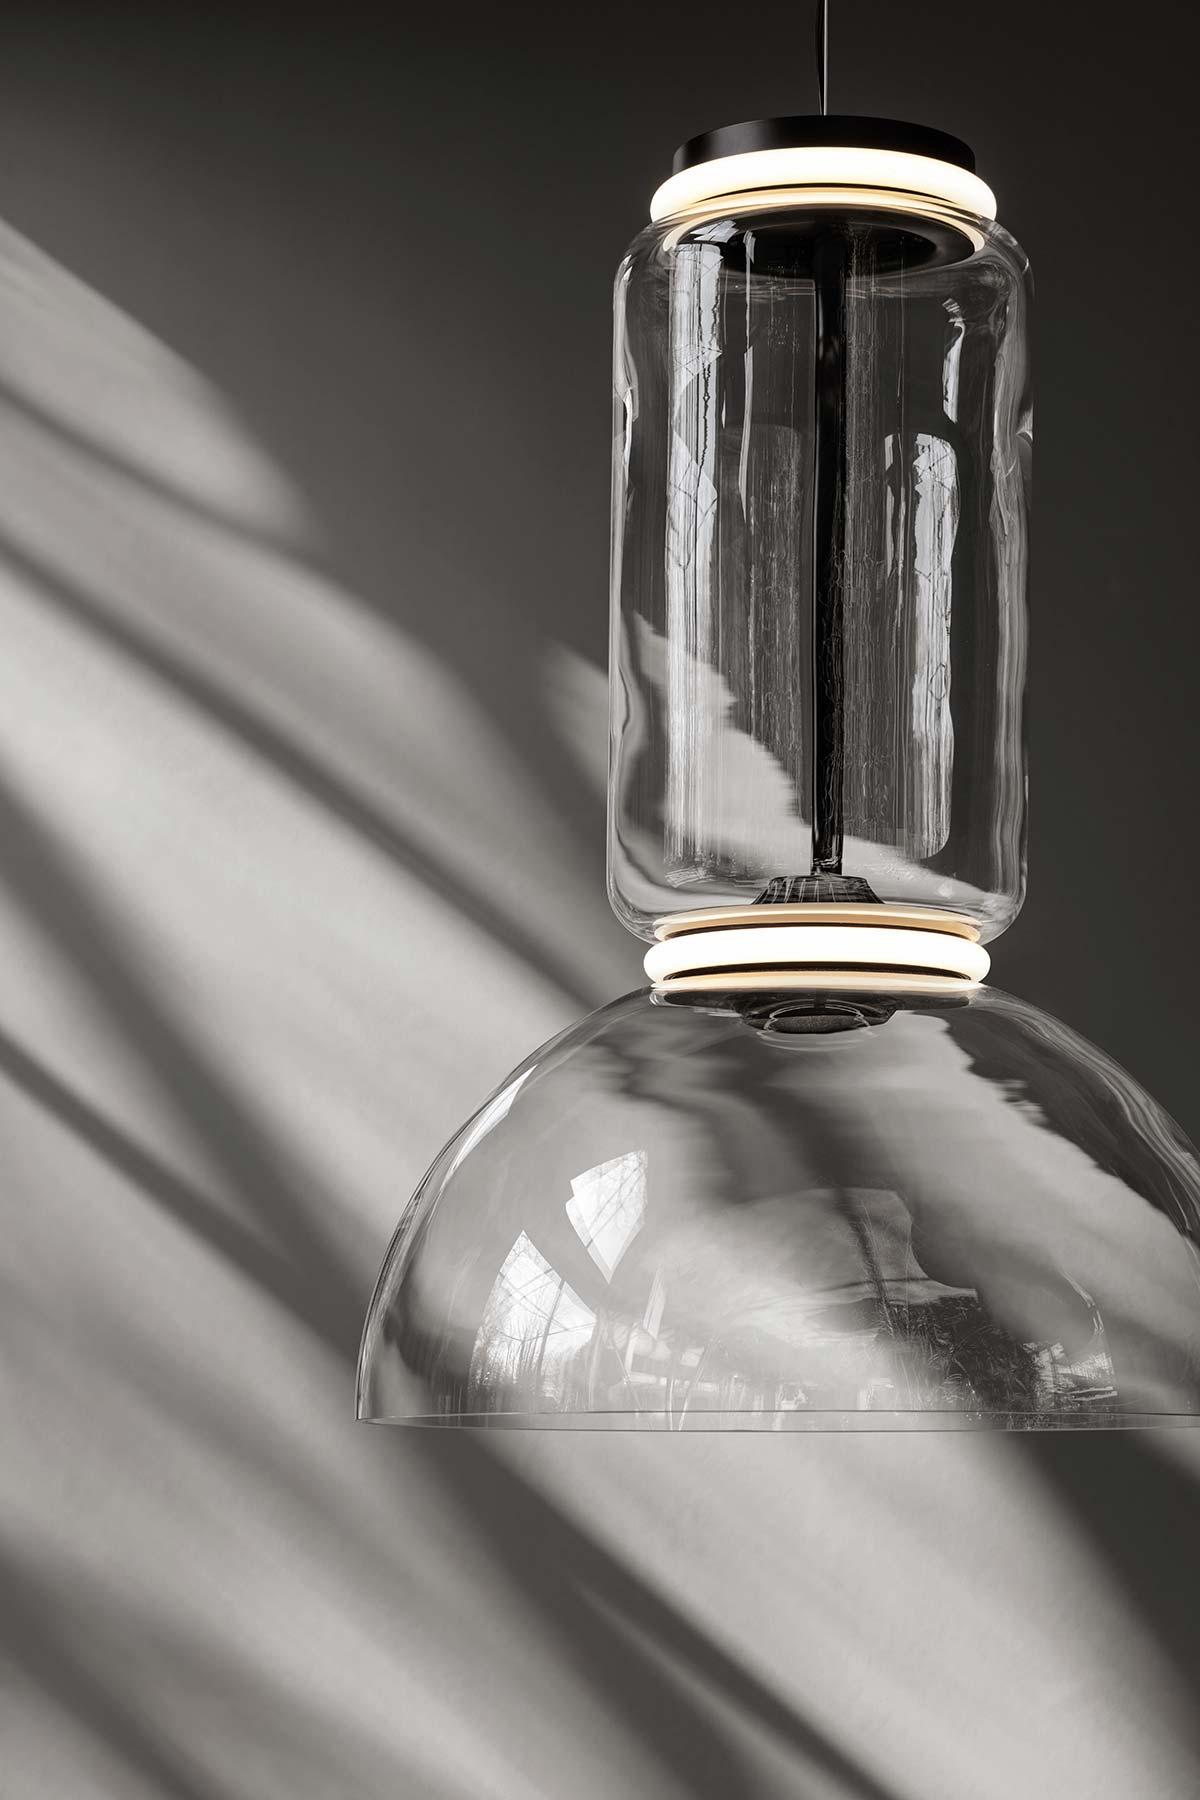 Noctambule by Flos, Design Konstantin Grcic - Photo © Santi Caleca